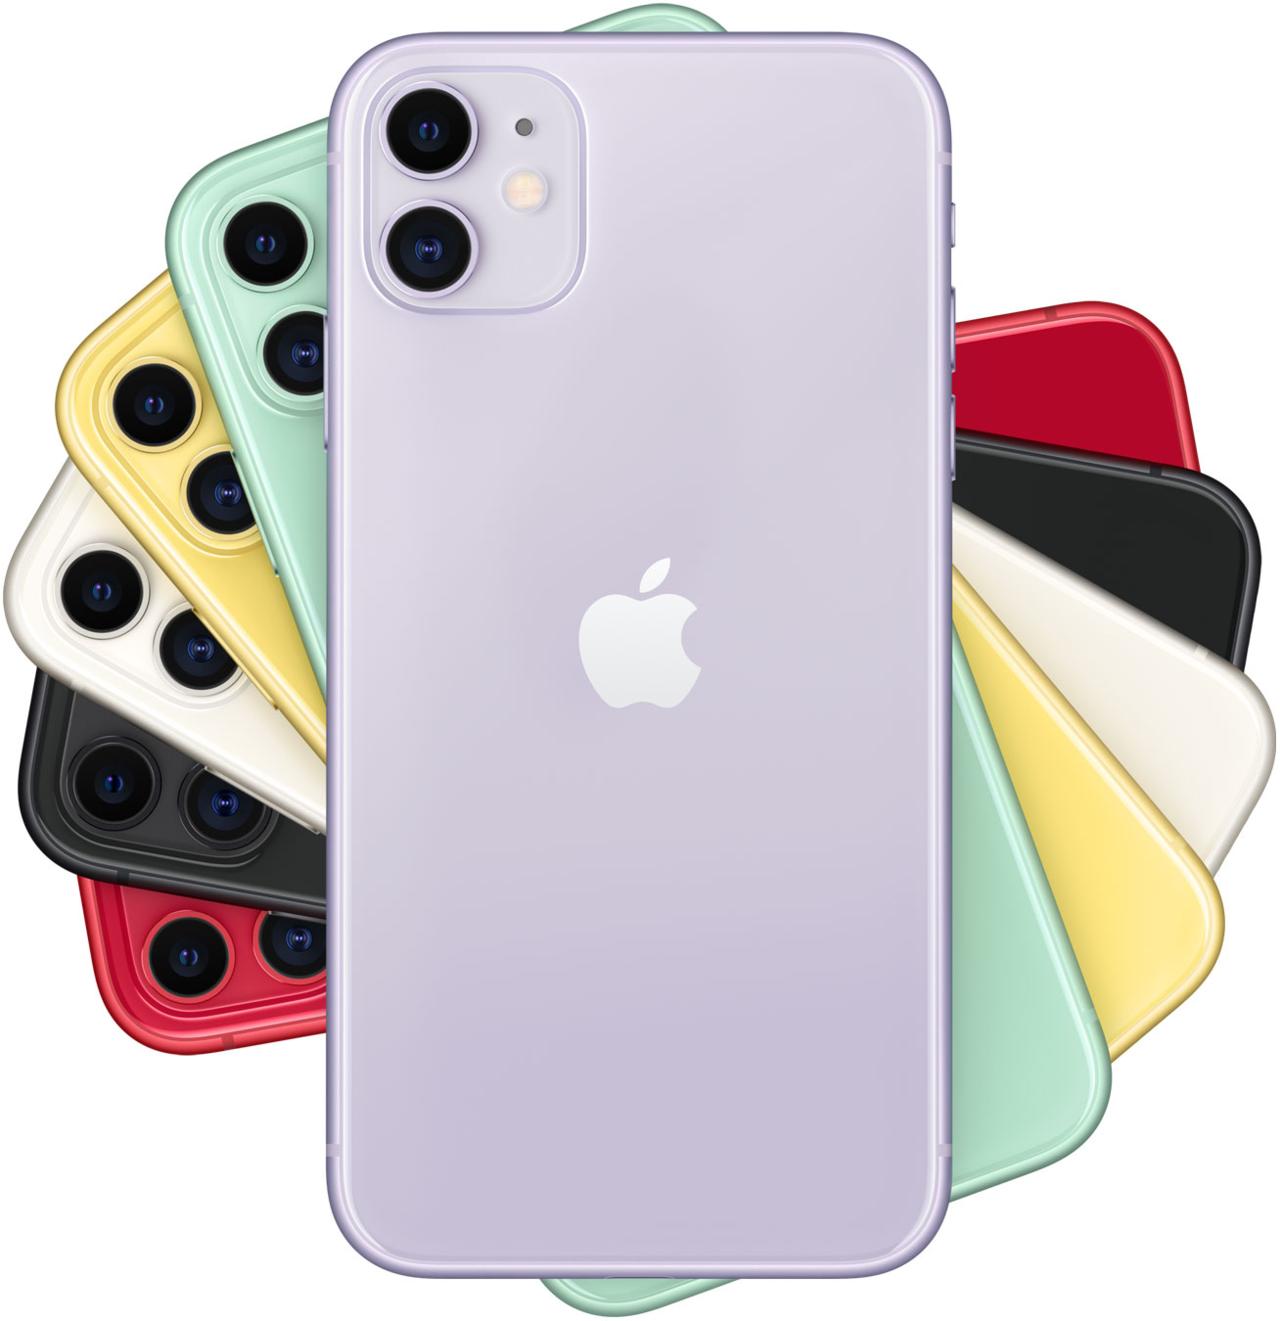 LINE釋出iOS9.16.5更新,讓原先無法使用偷看訊息功能的iPhone 1...